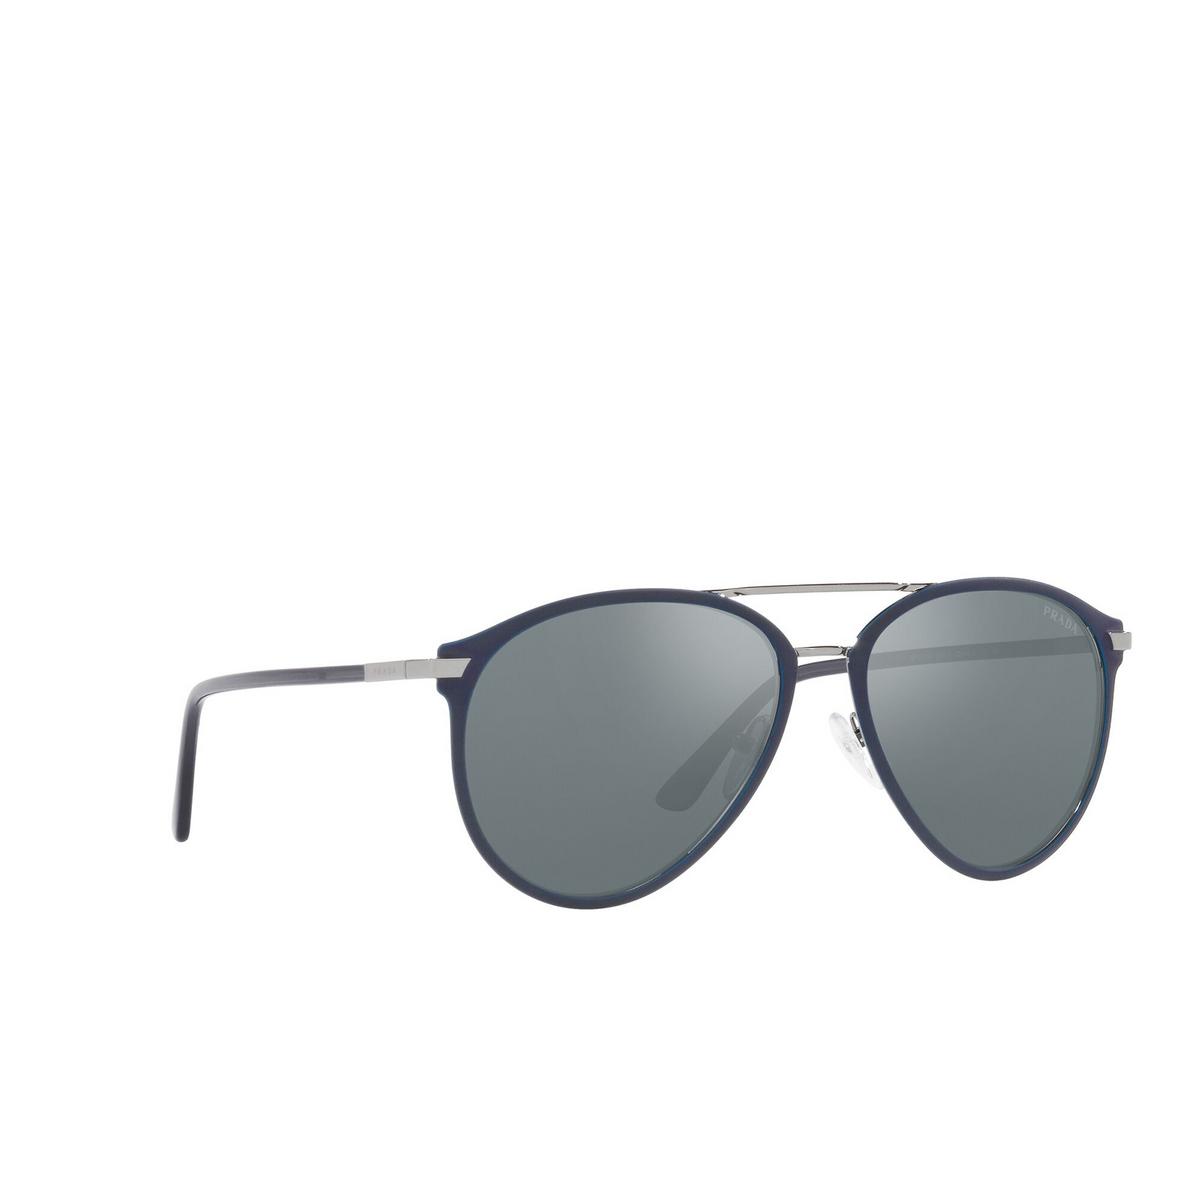 Prada® Aviator Sunglasses: PR 51WS color Matte Baltic / Gunmetal 02N01A - three-quarters view.